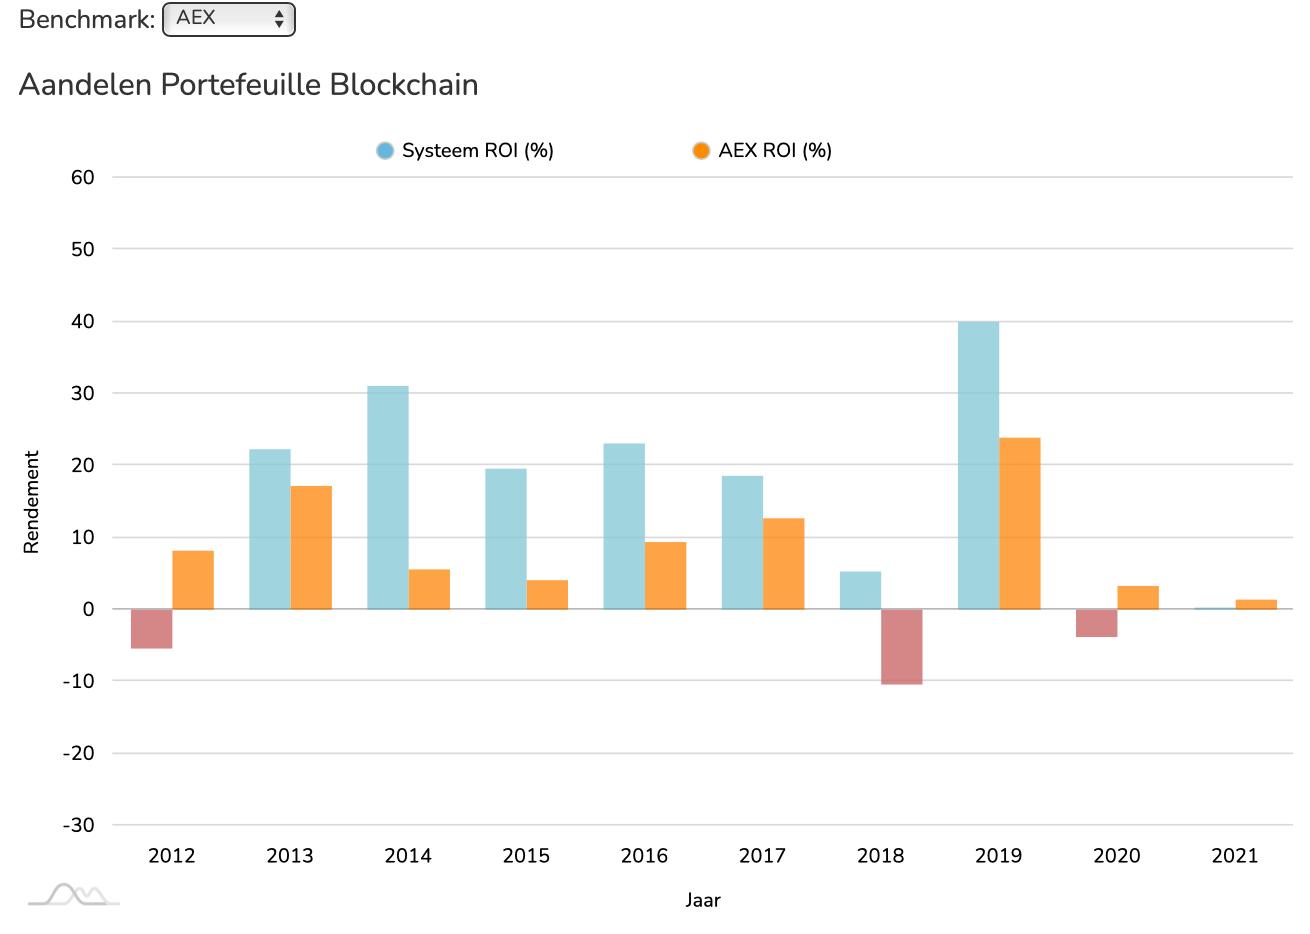 Aandelen Blockchain ROI vs AEX